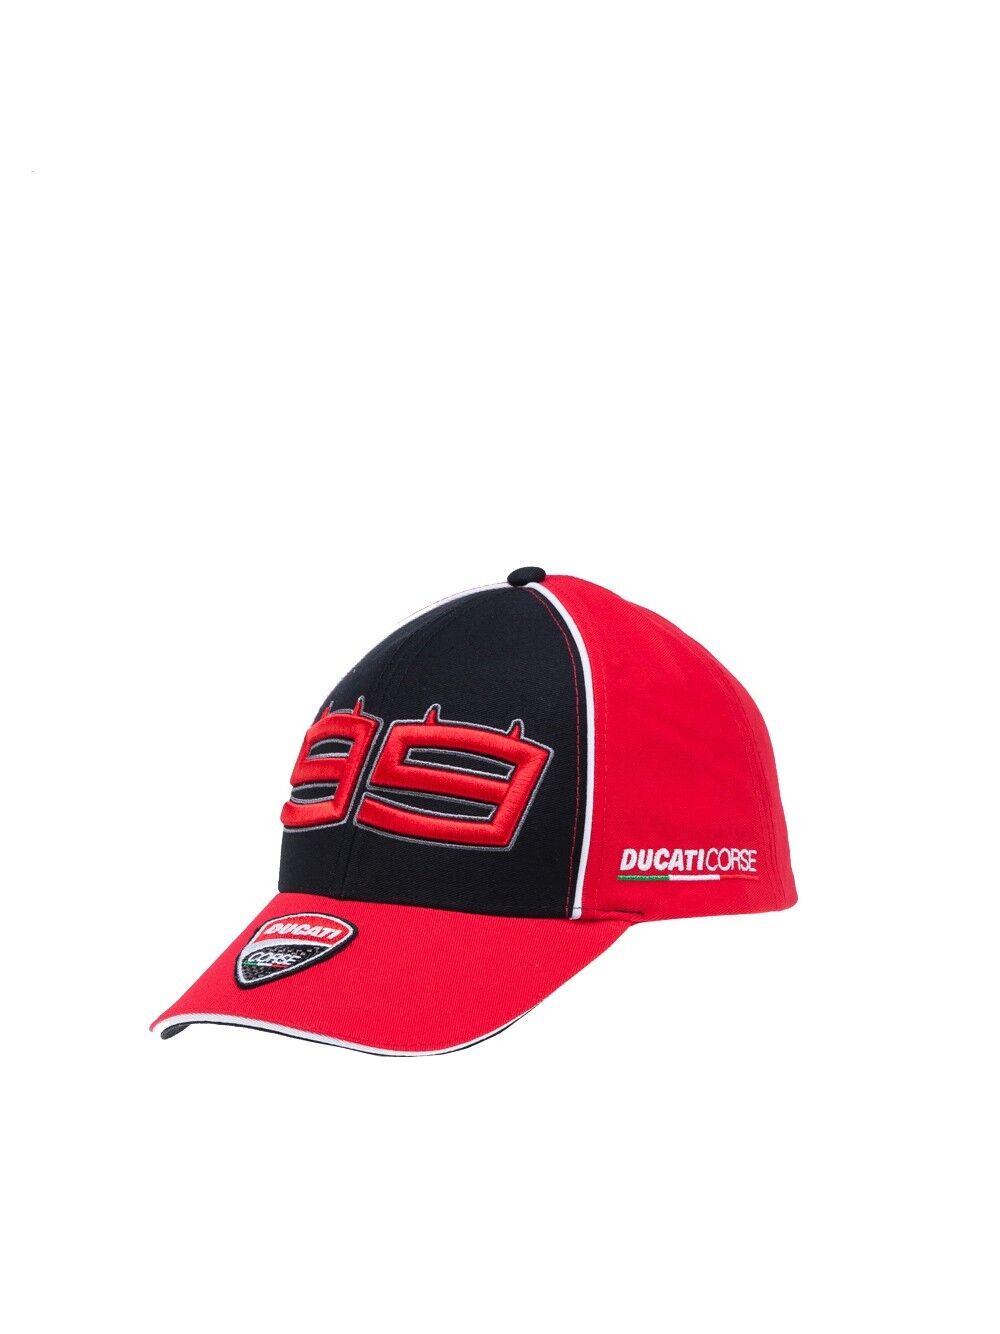 Official Jorge Lorenzo Ducati Dual Cap -  17 46008